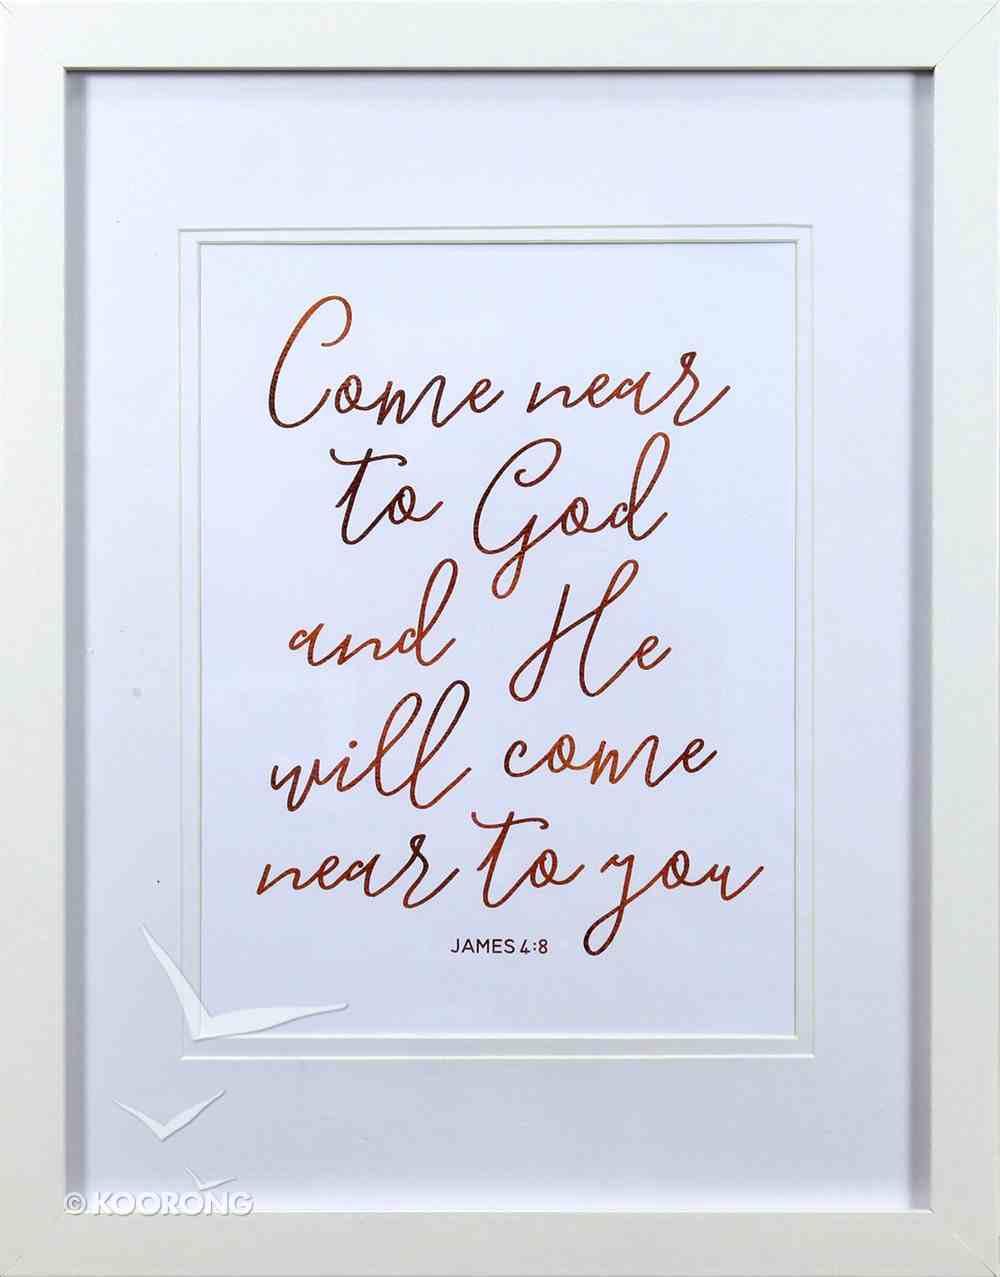 Medium Framed Copper Calligraphy Print: Come Near to God, James 4:8 Plaque